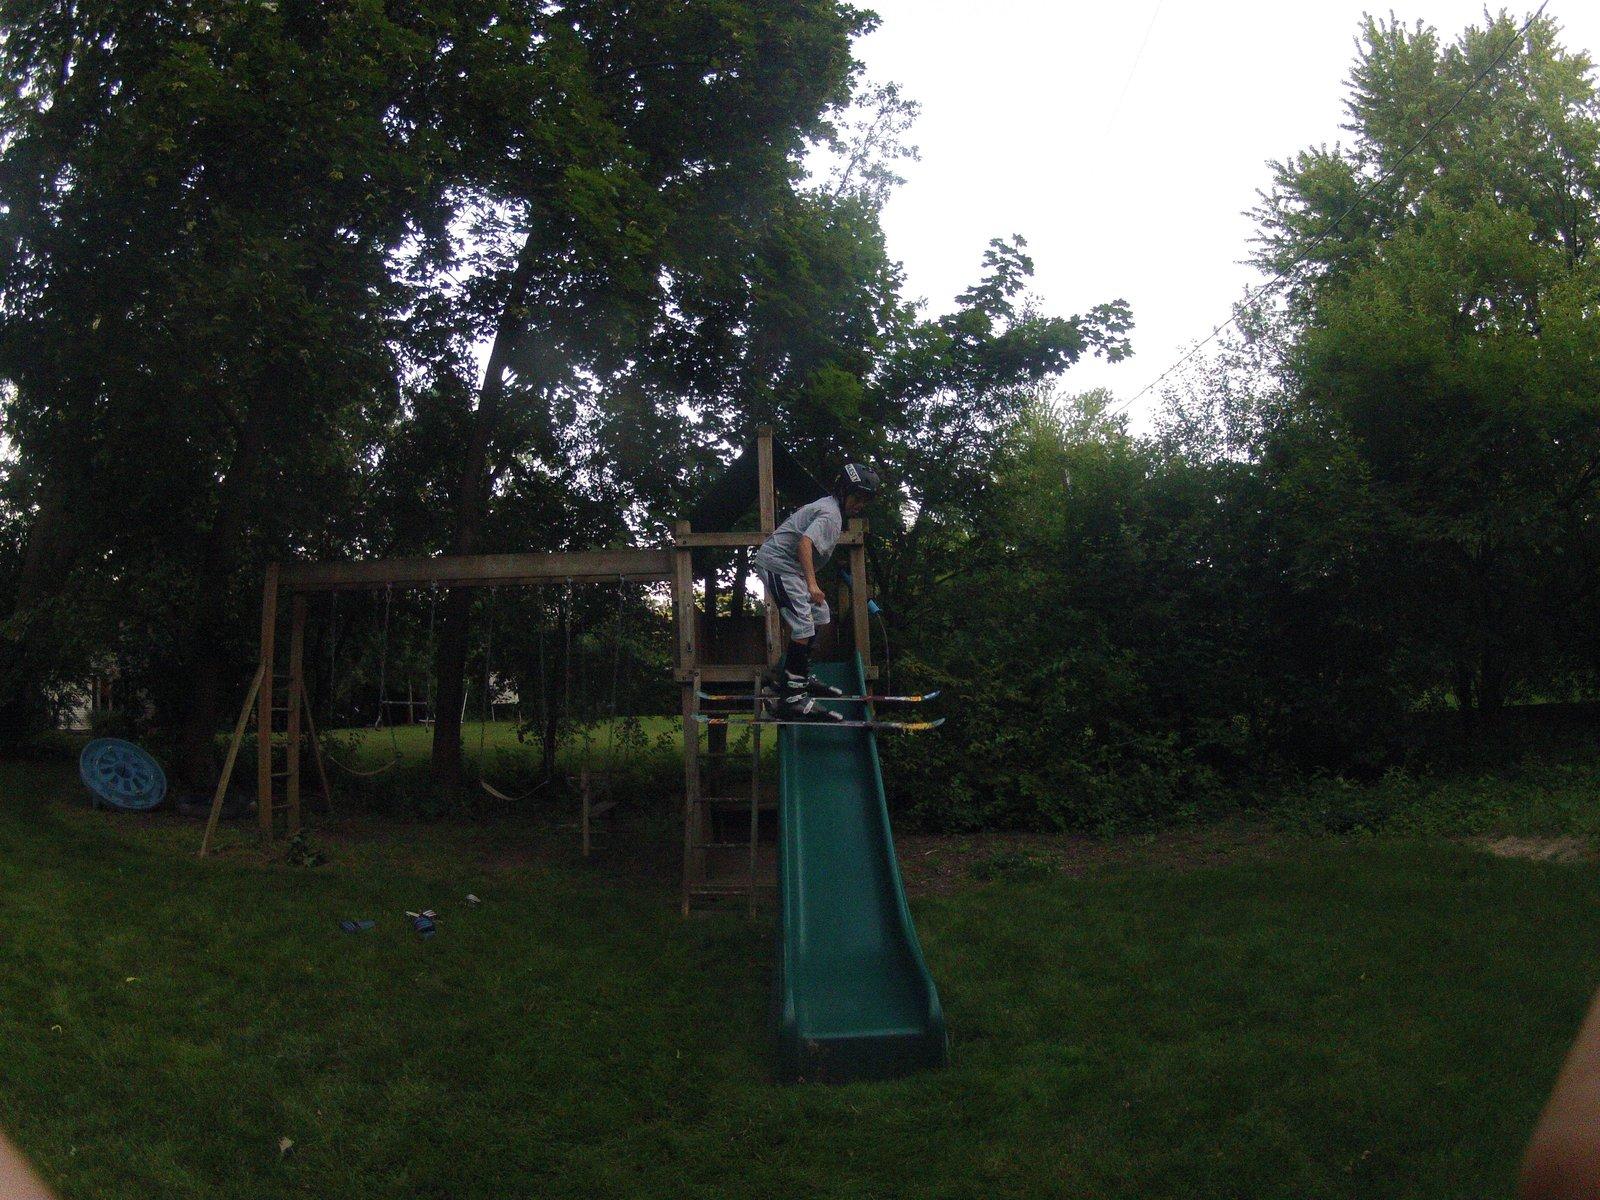 Backyard Skiing Down A Slide!